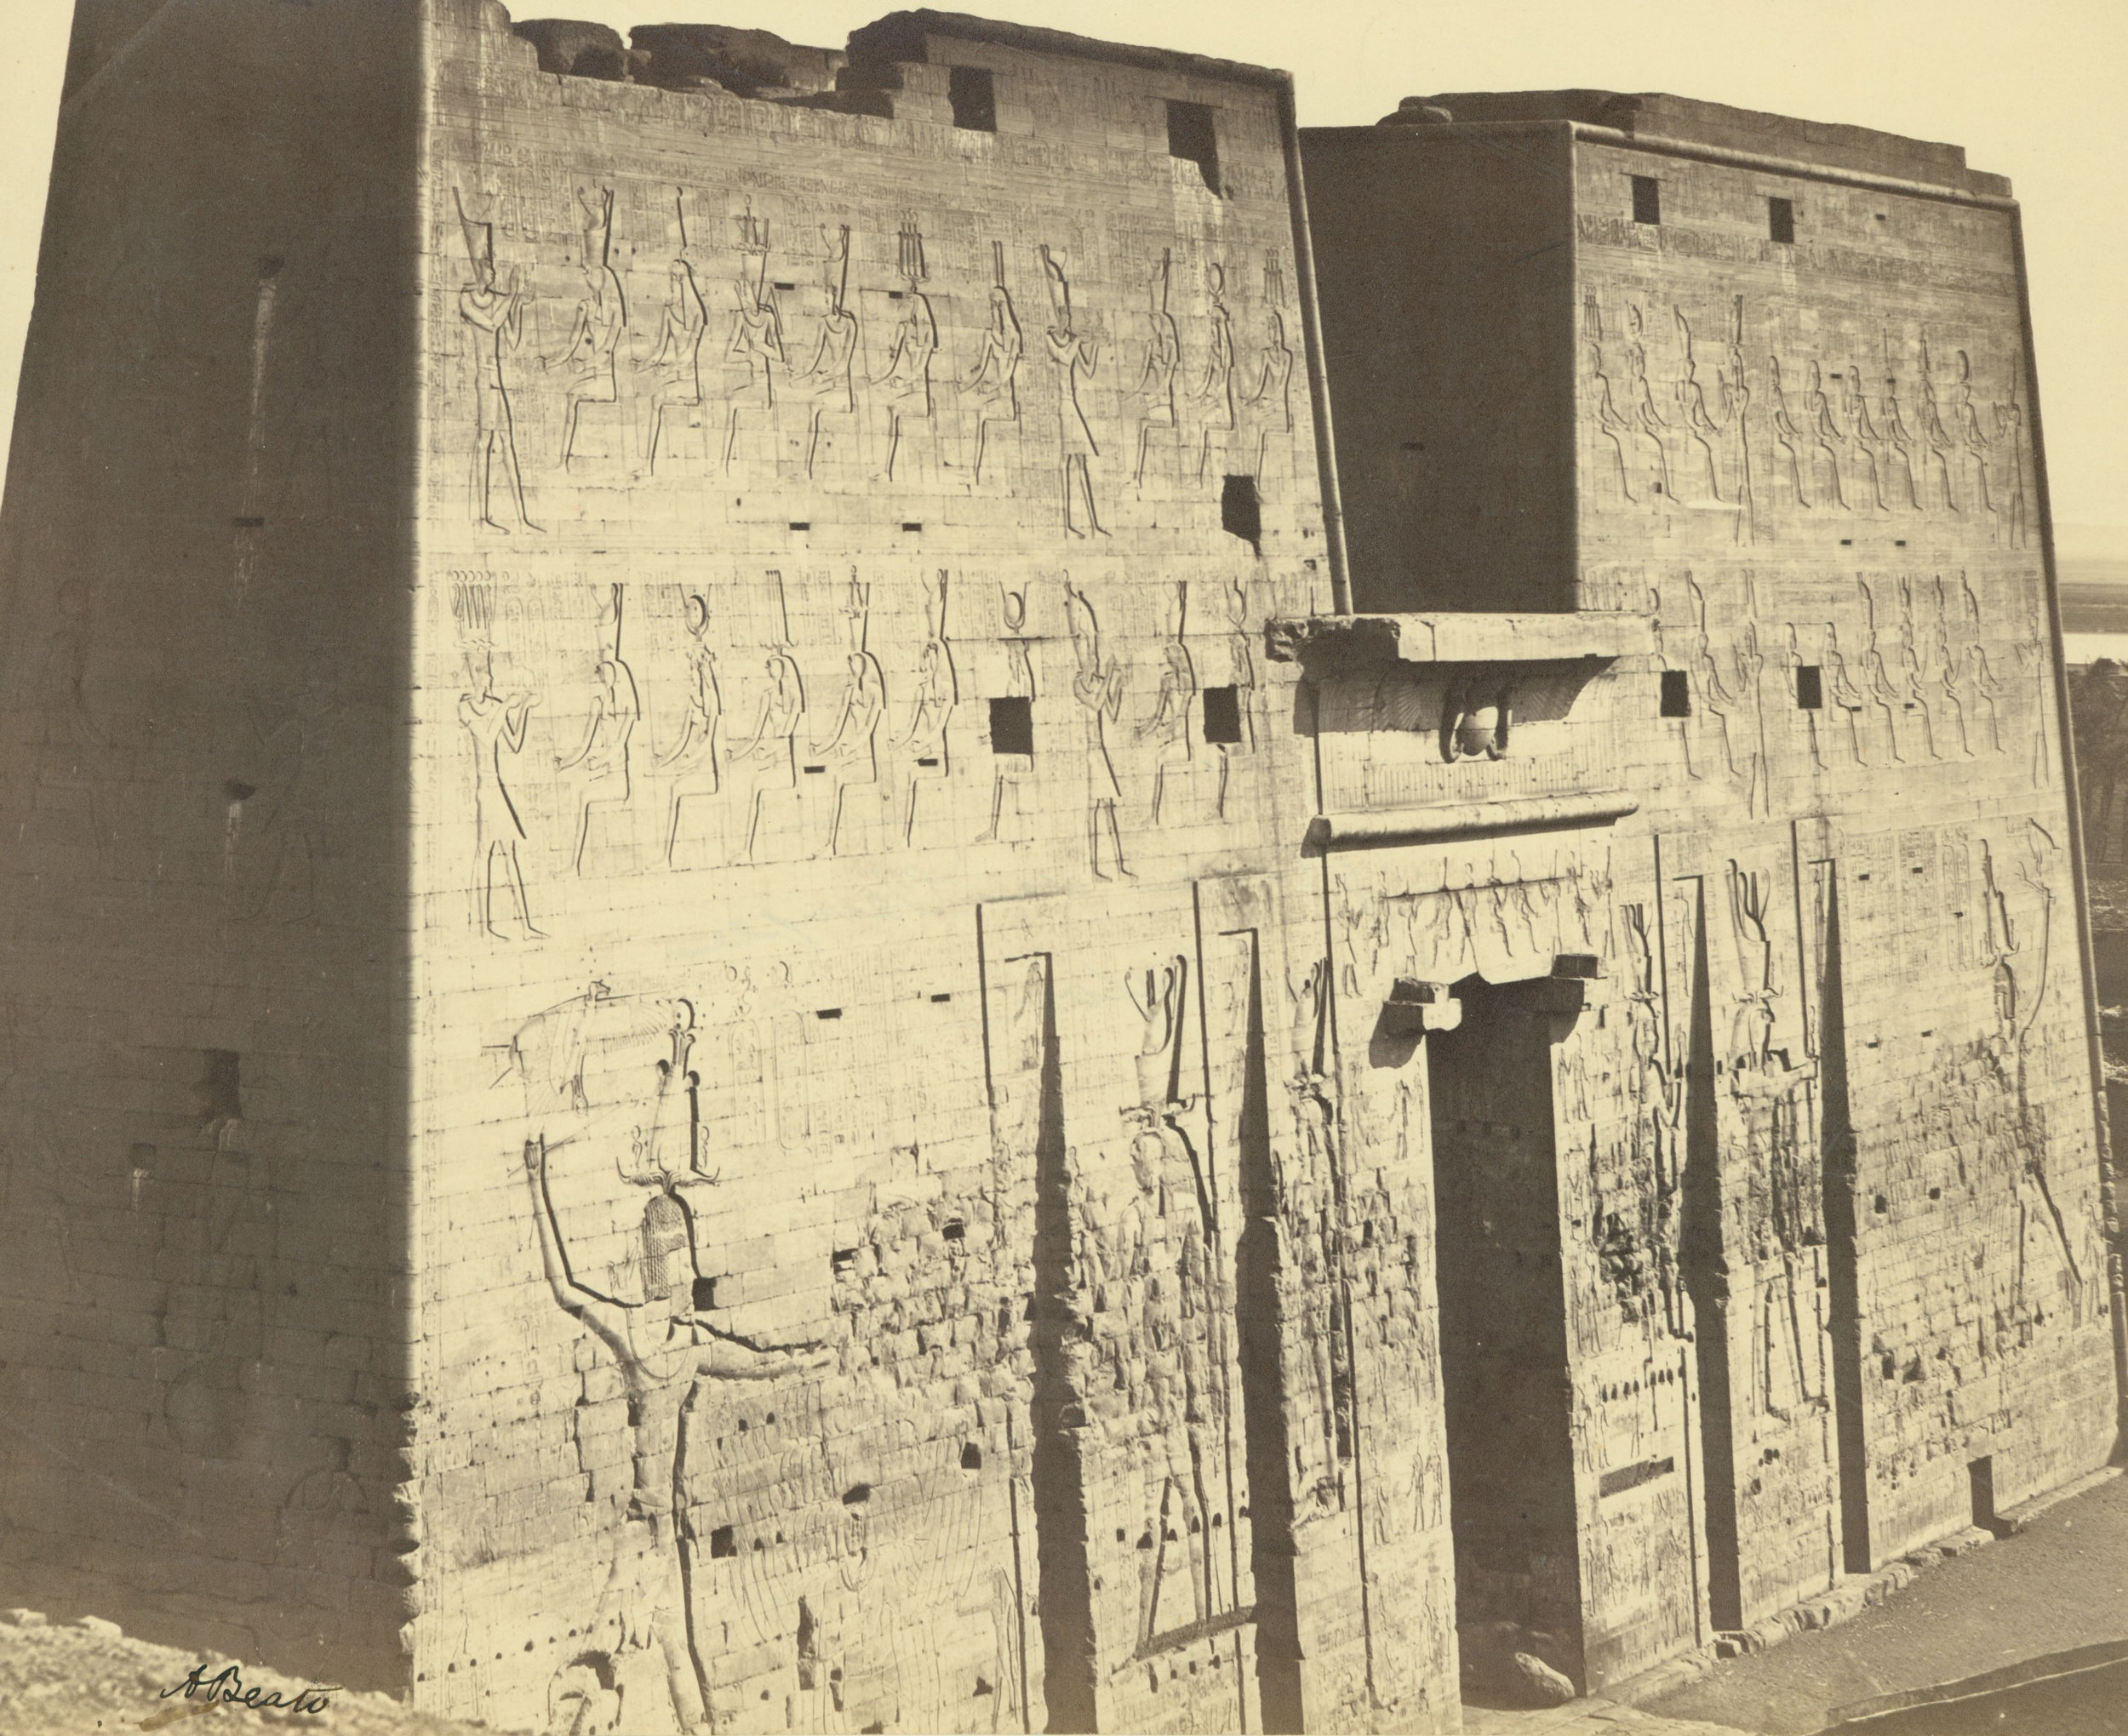 ANTONIO BEATO Pylon of the Temple of Horus at Edfu, Egypt c. 1887